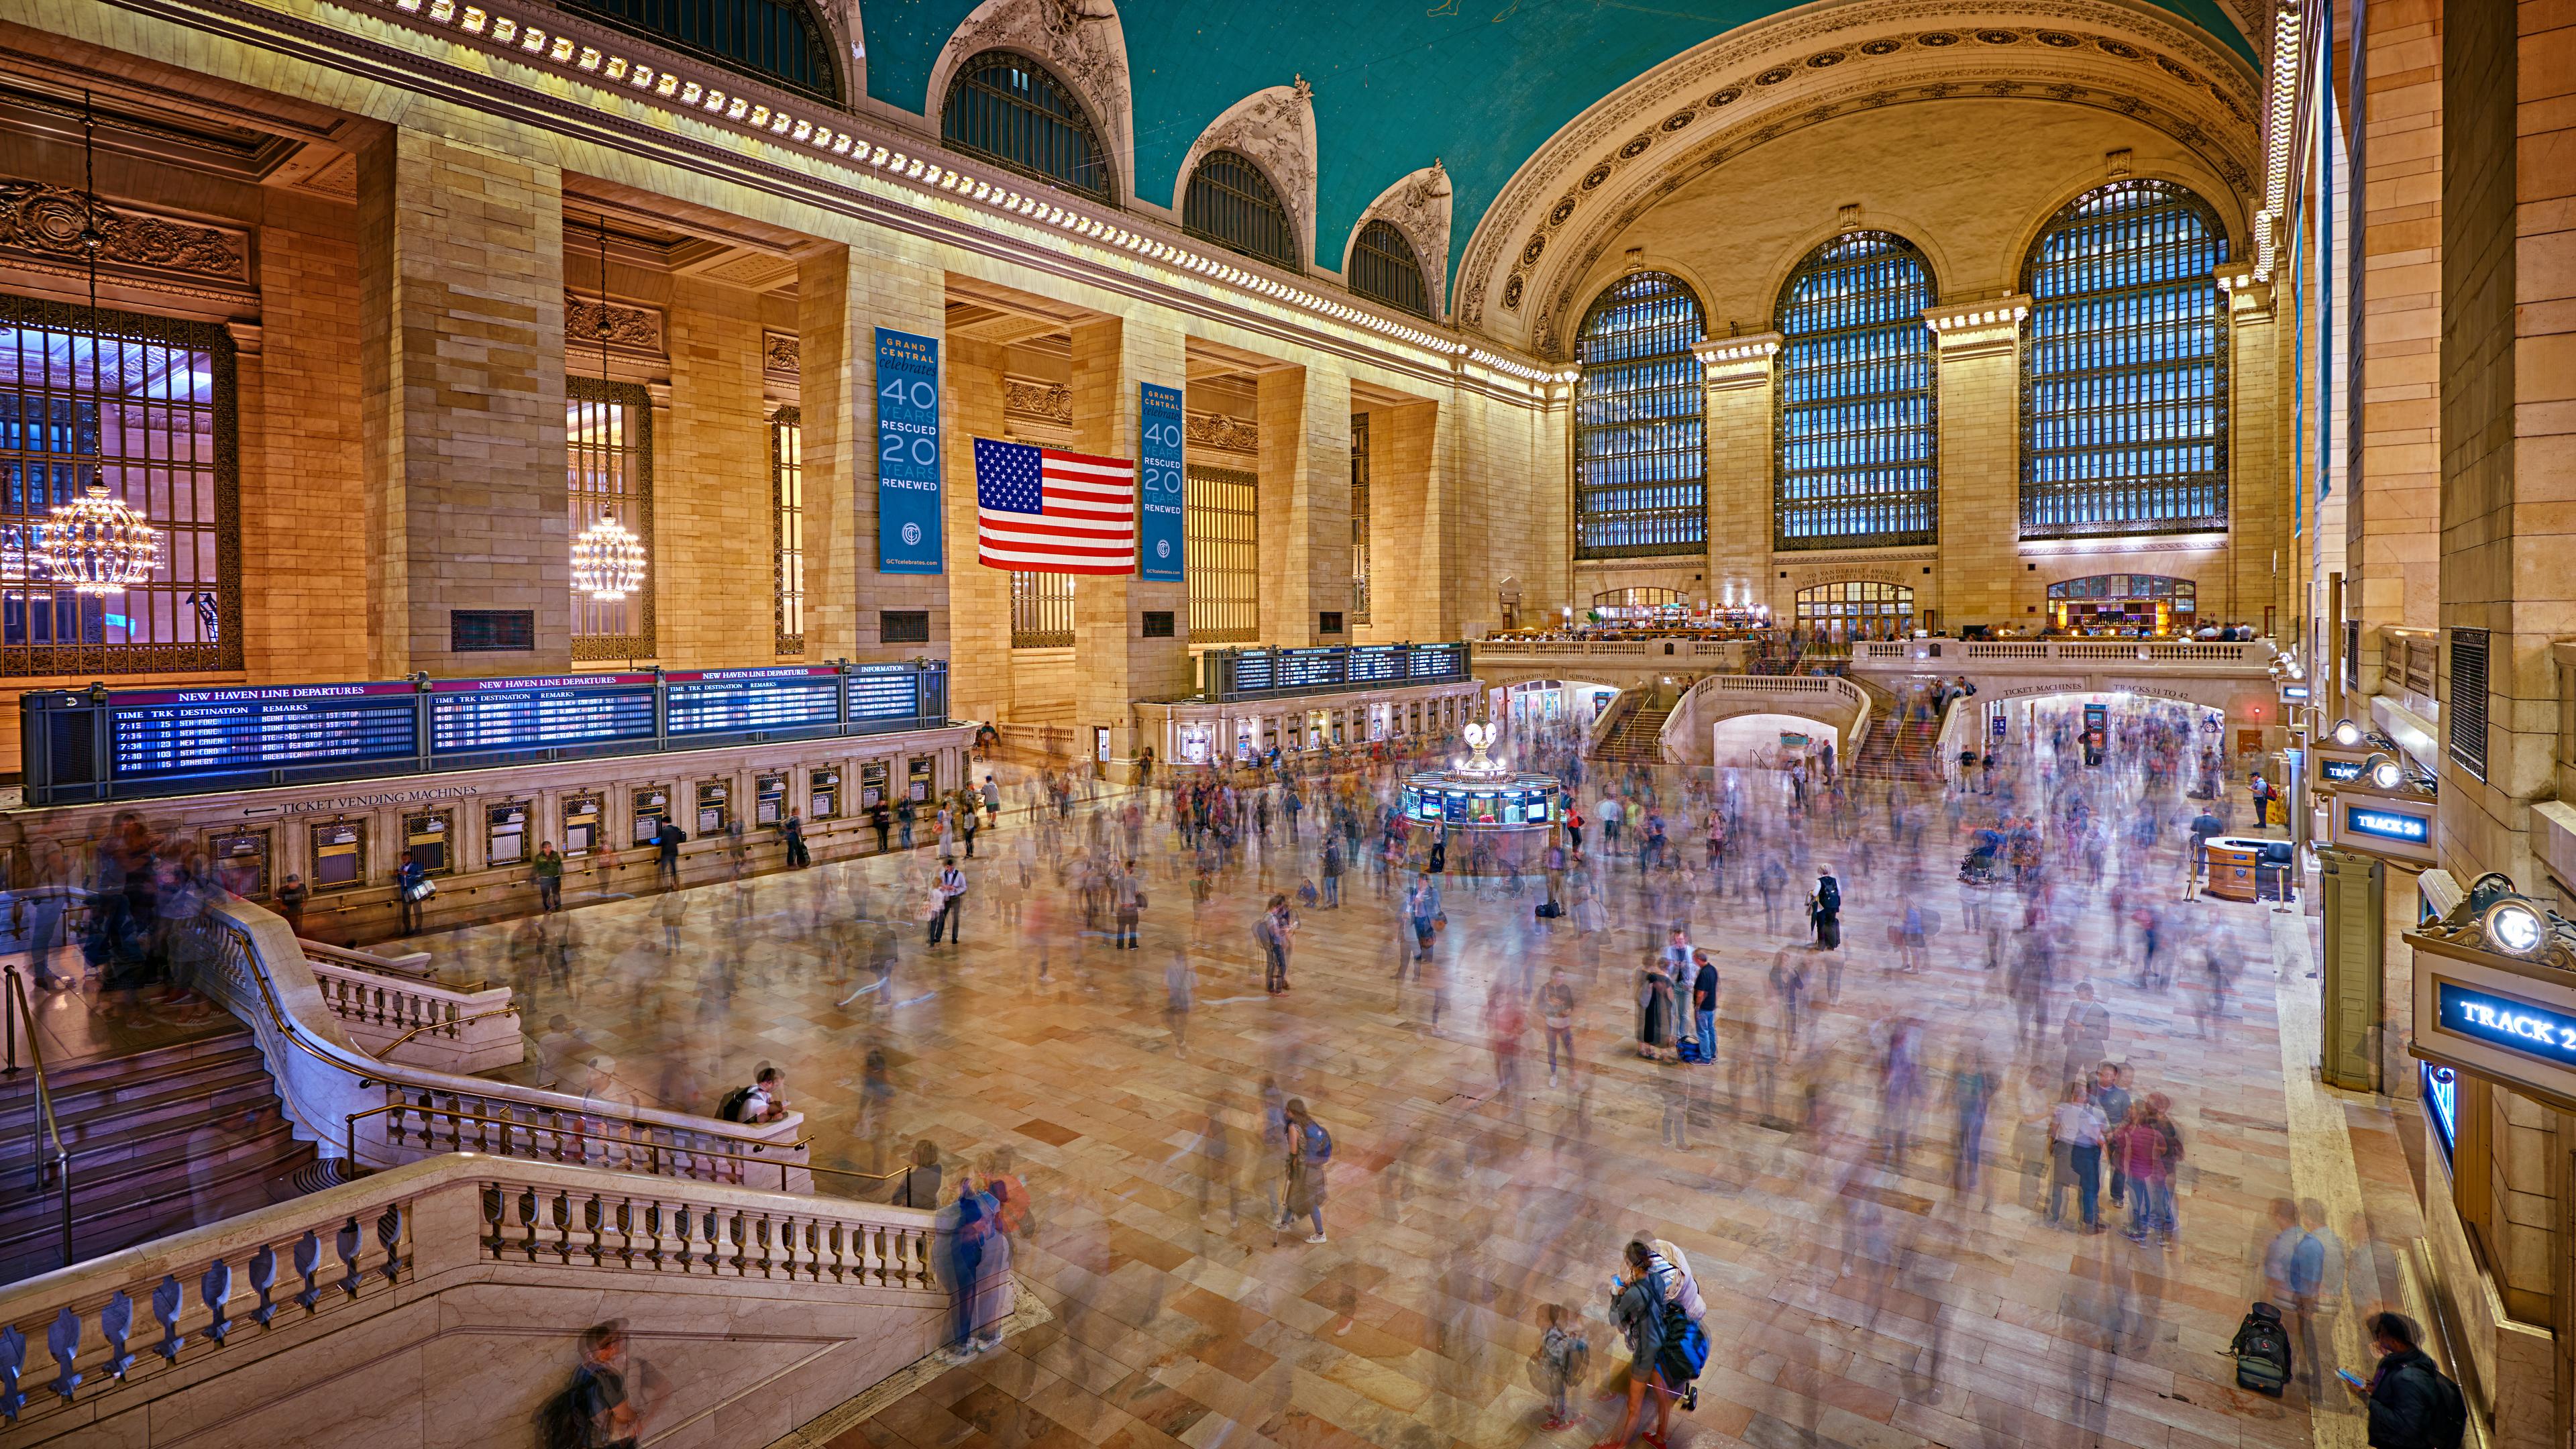 Grand Central Station. New York